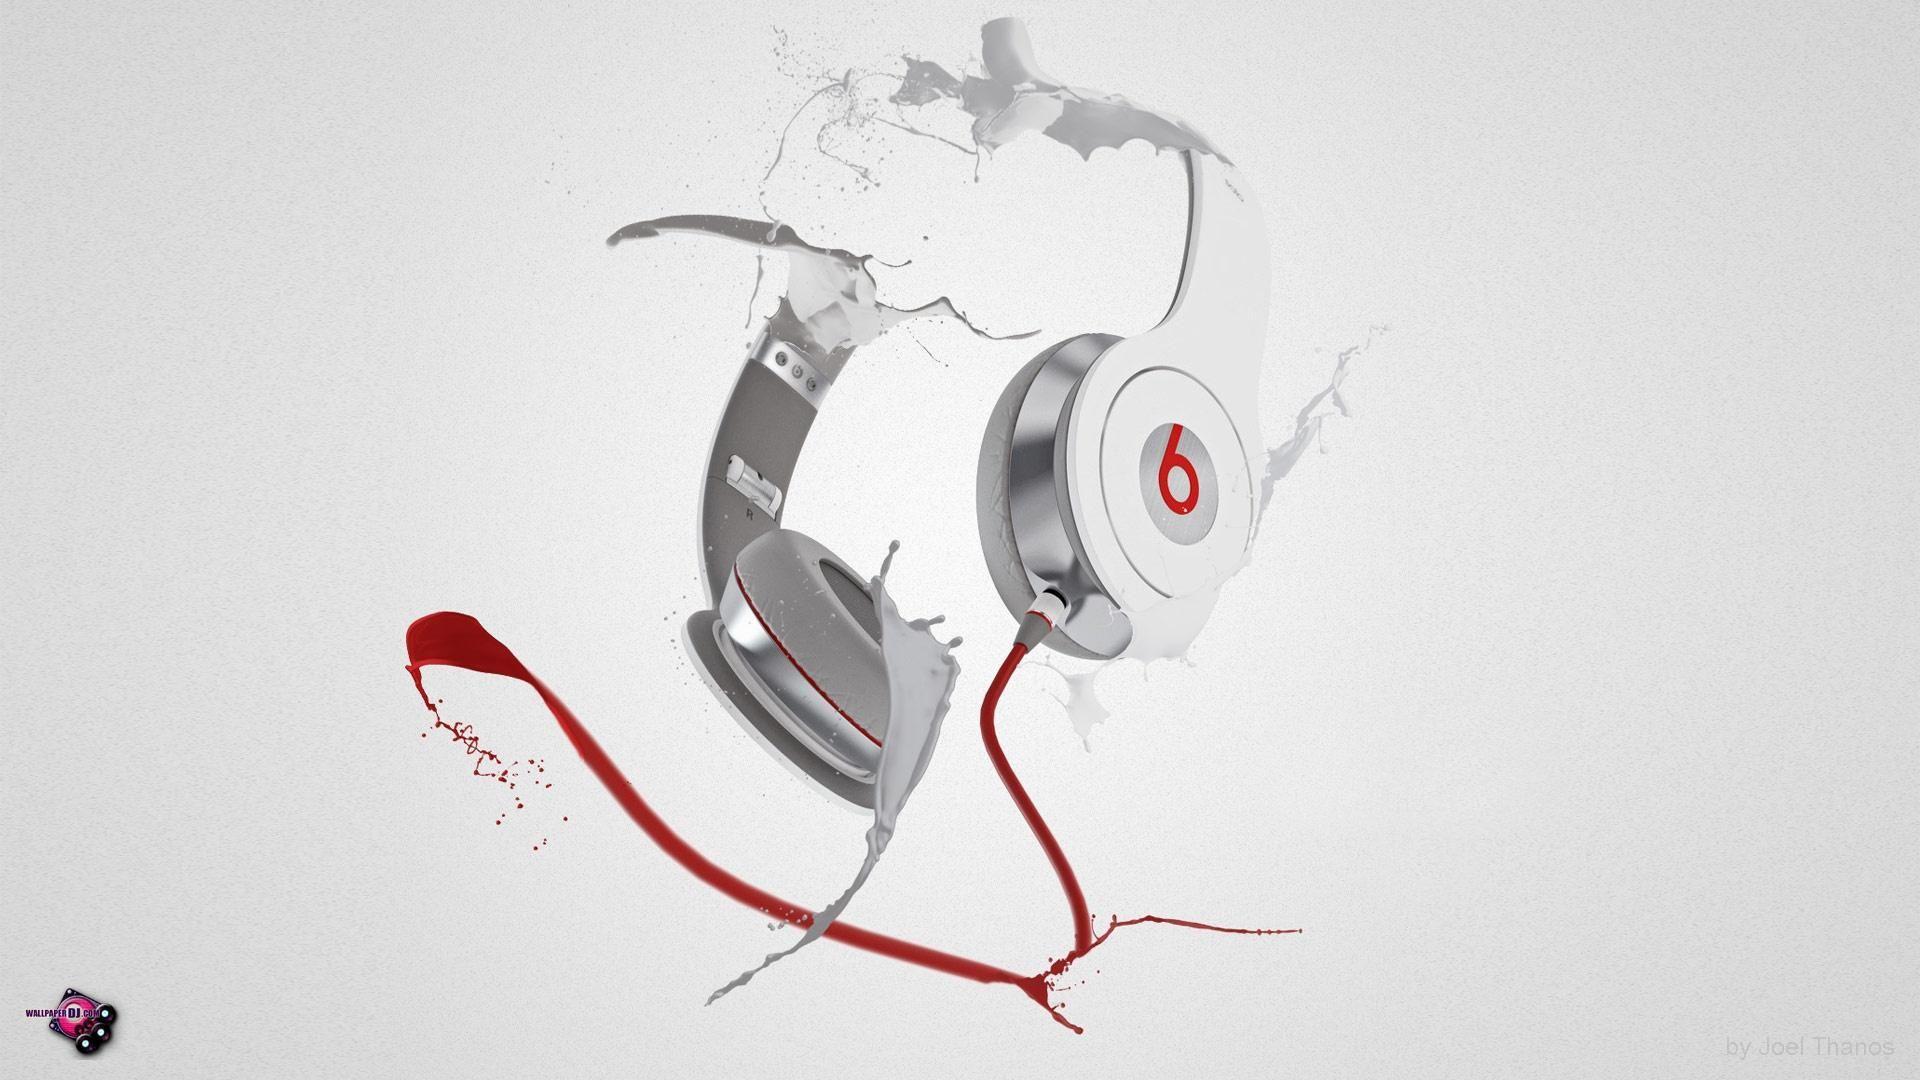 HD Background Beats Audio Logo Red Black Symbol Wallpaper 1366x768 38 Wallpapers